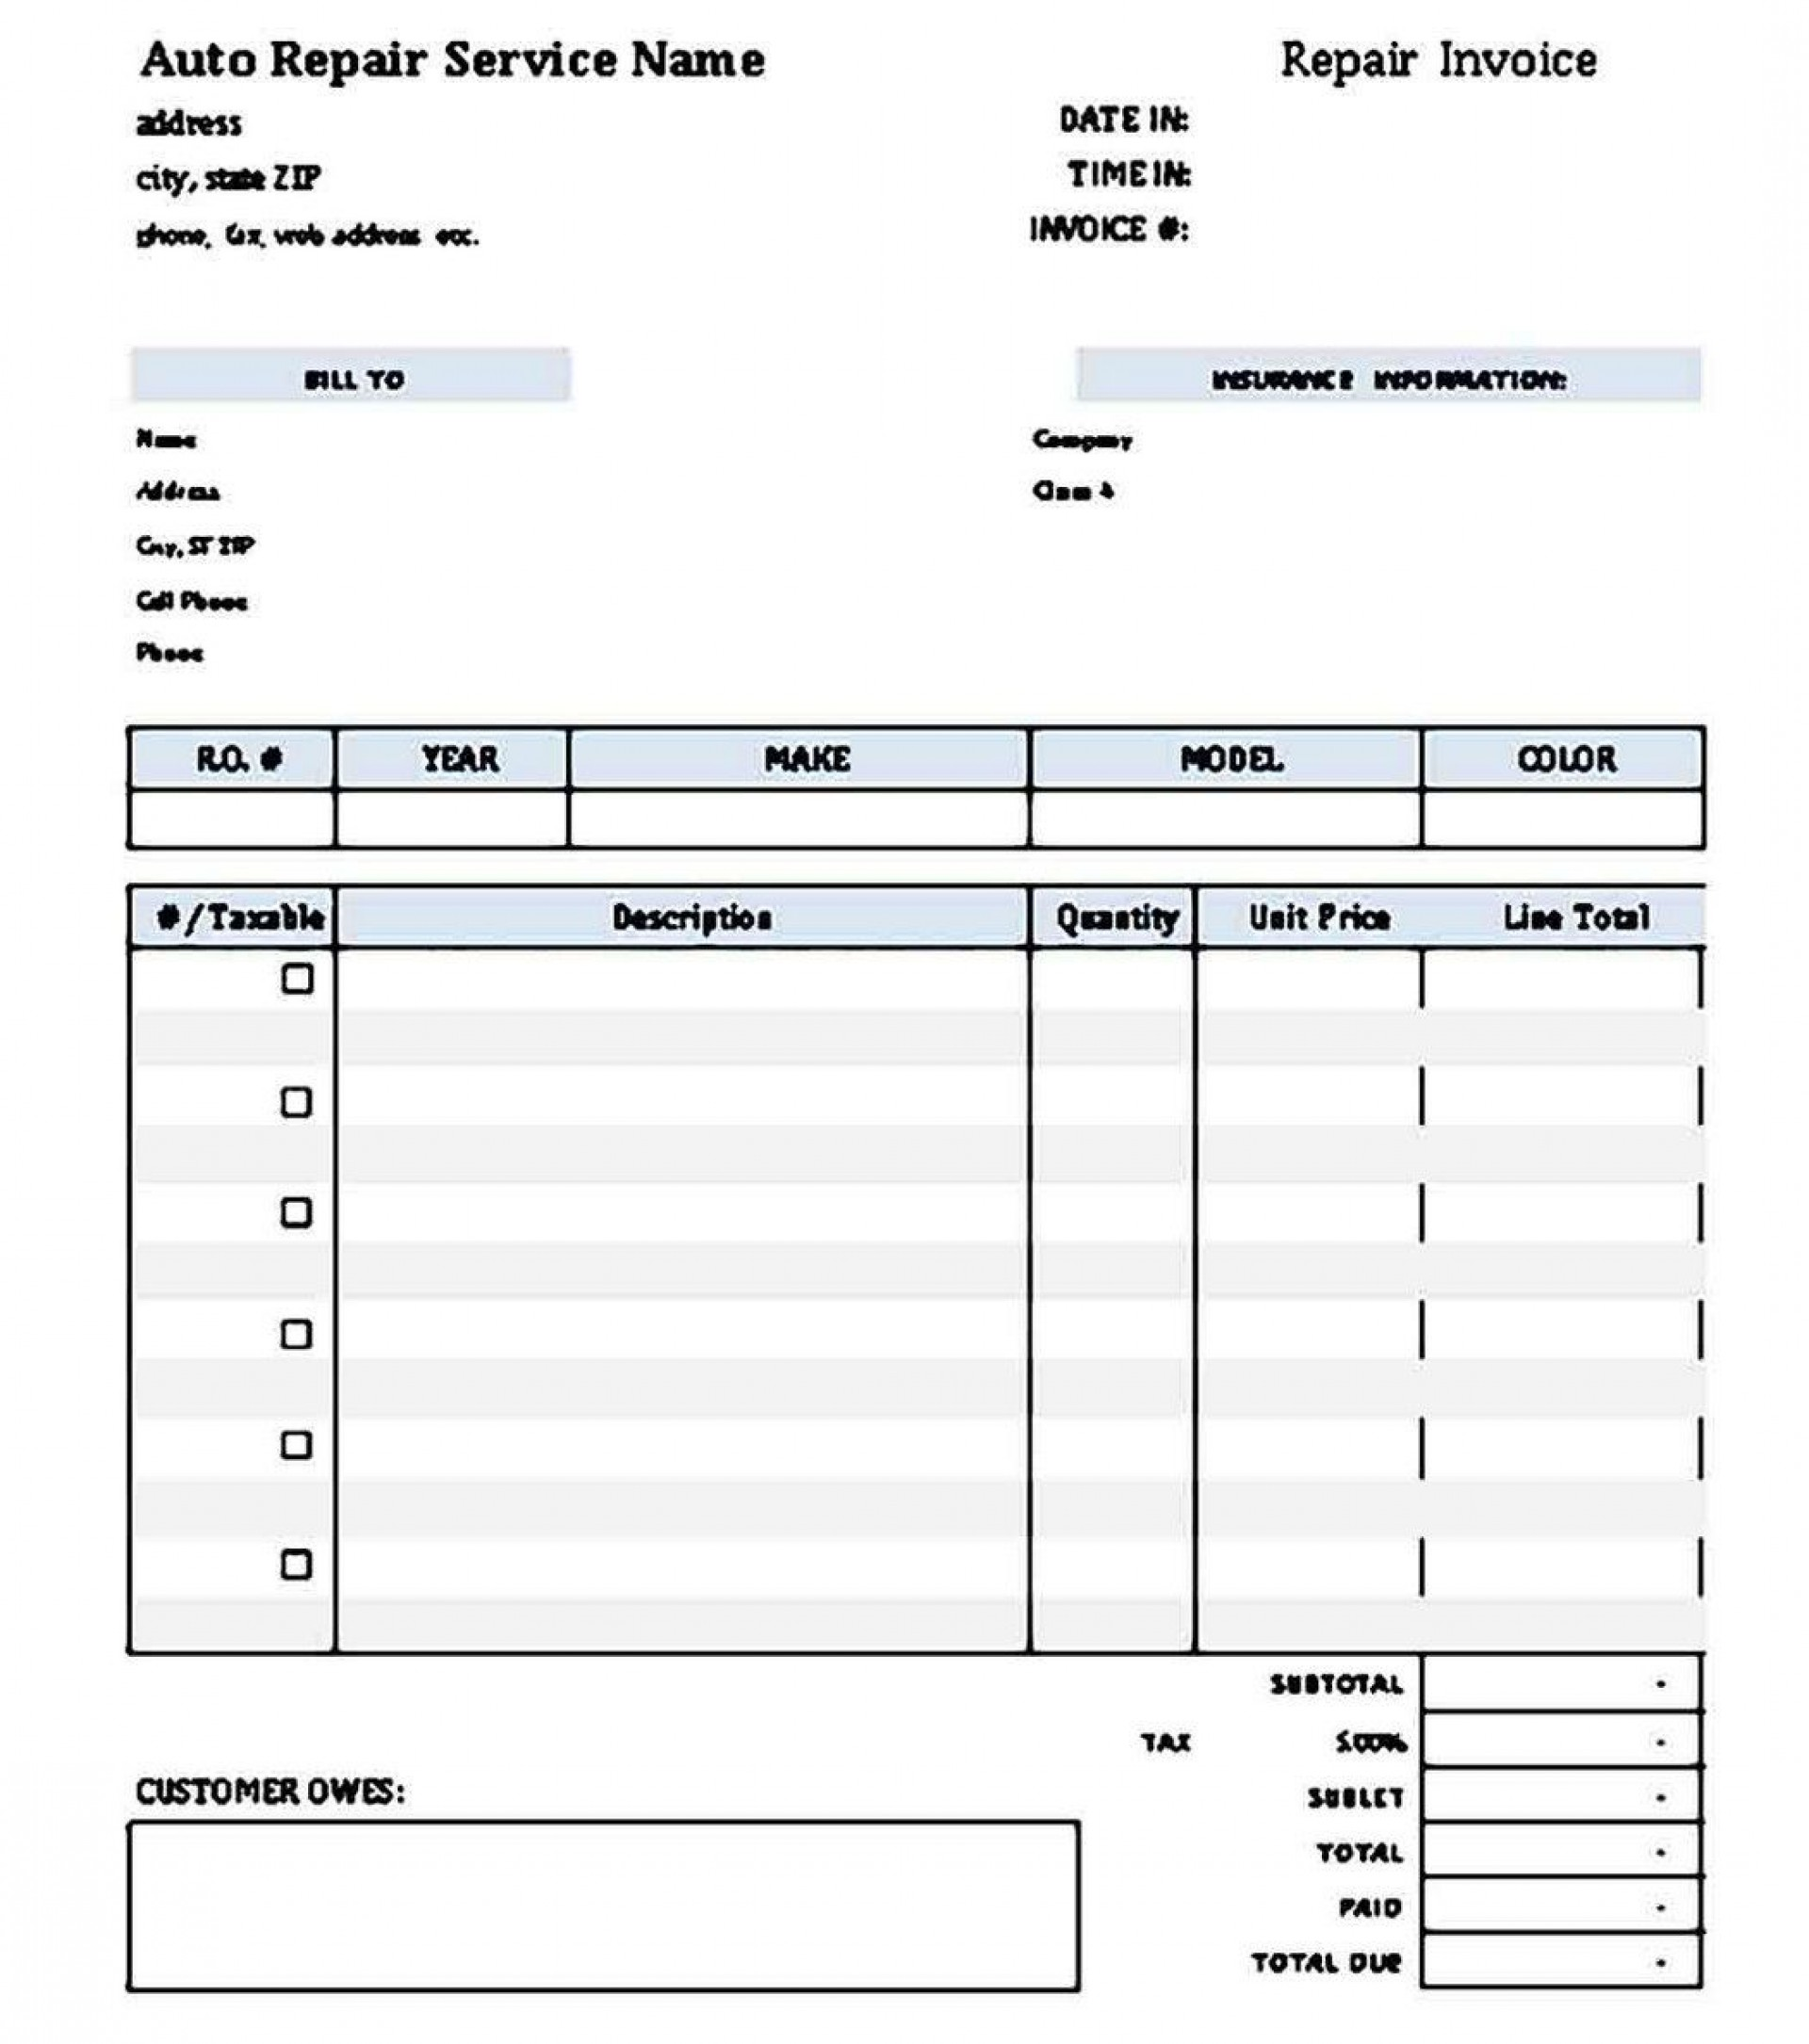 009 Archaicawful Microsoft Excel Auto Repair Invoice Template Idea 1920